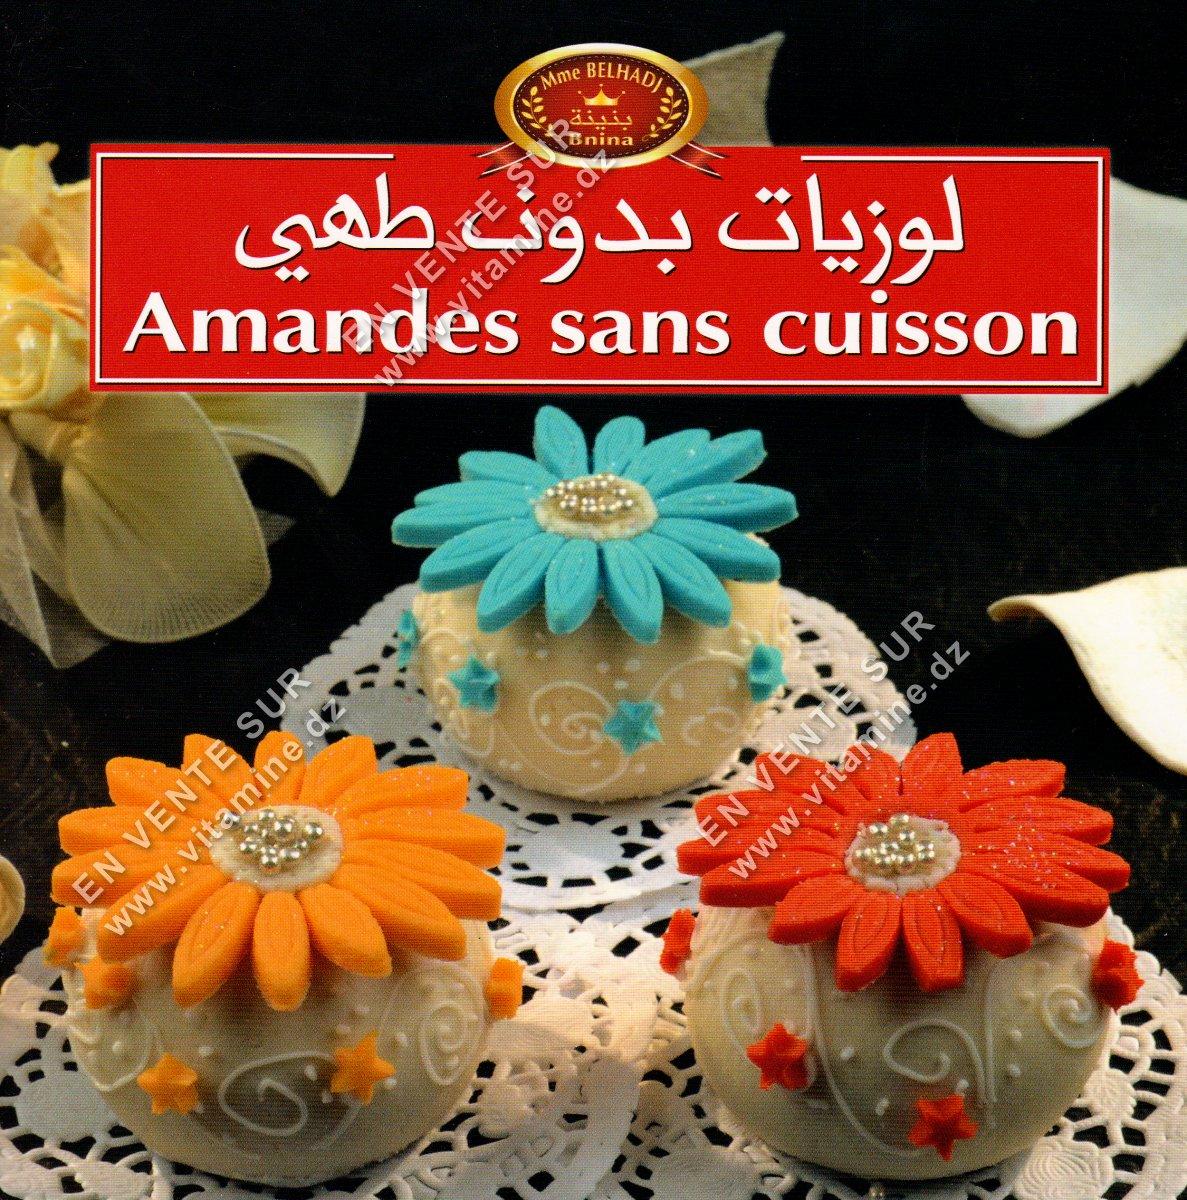 Bnina - Amandes sans cuisson